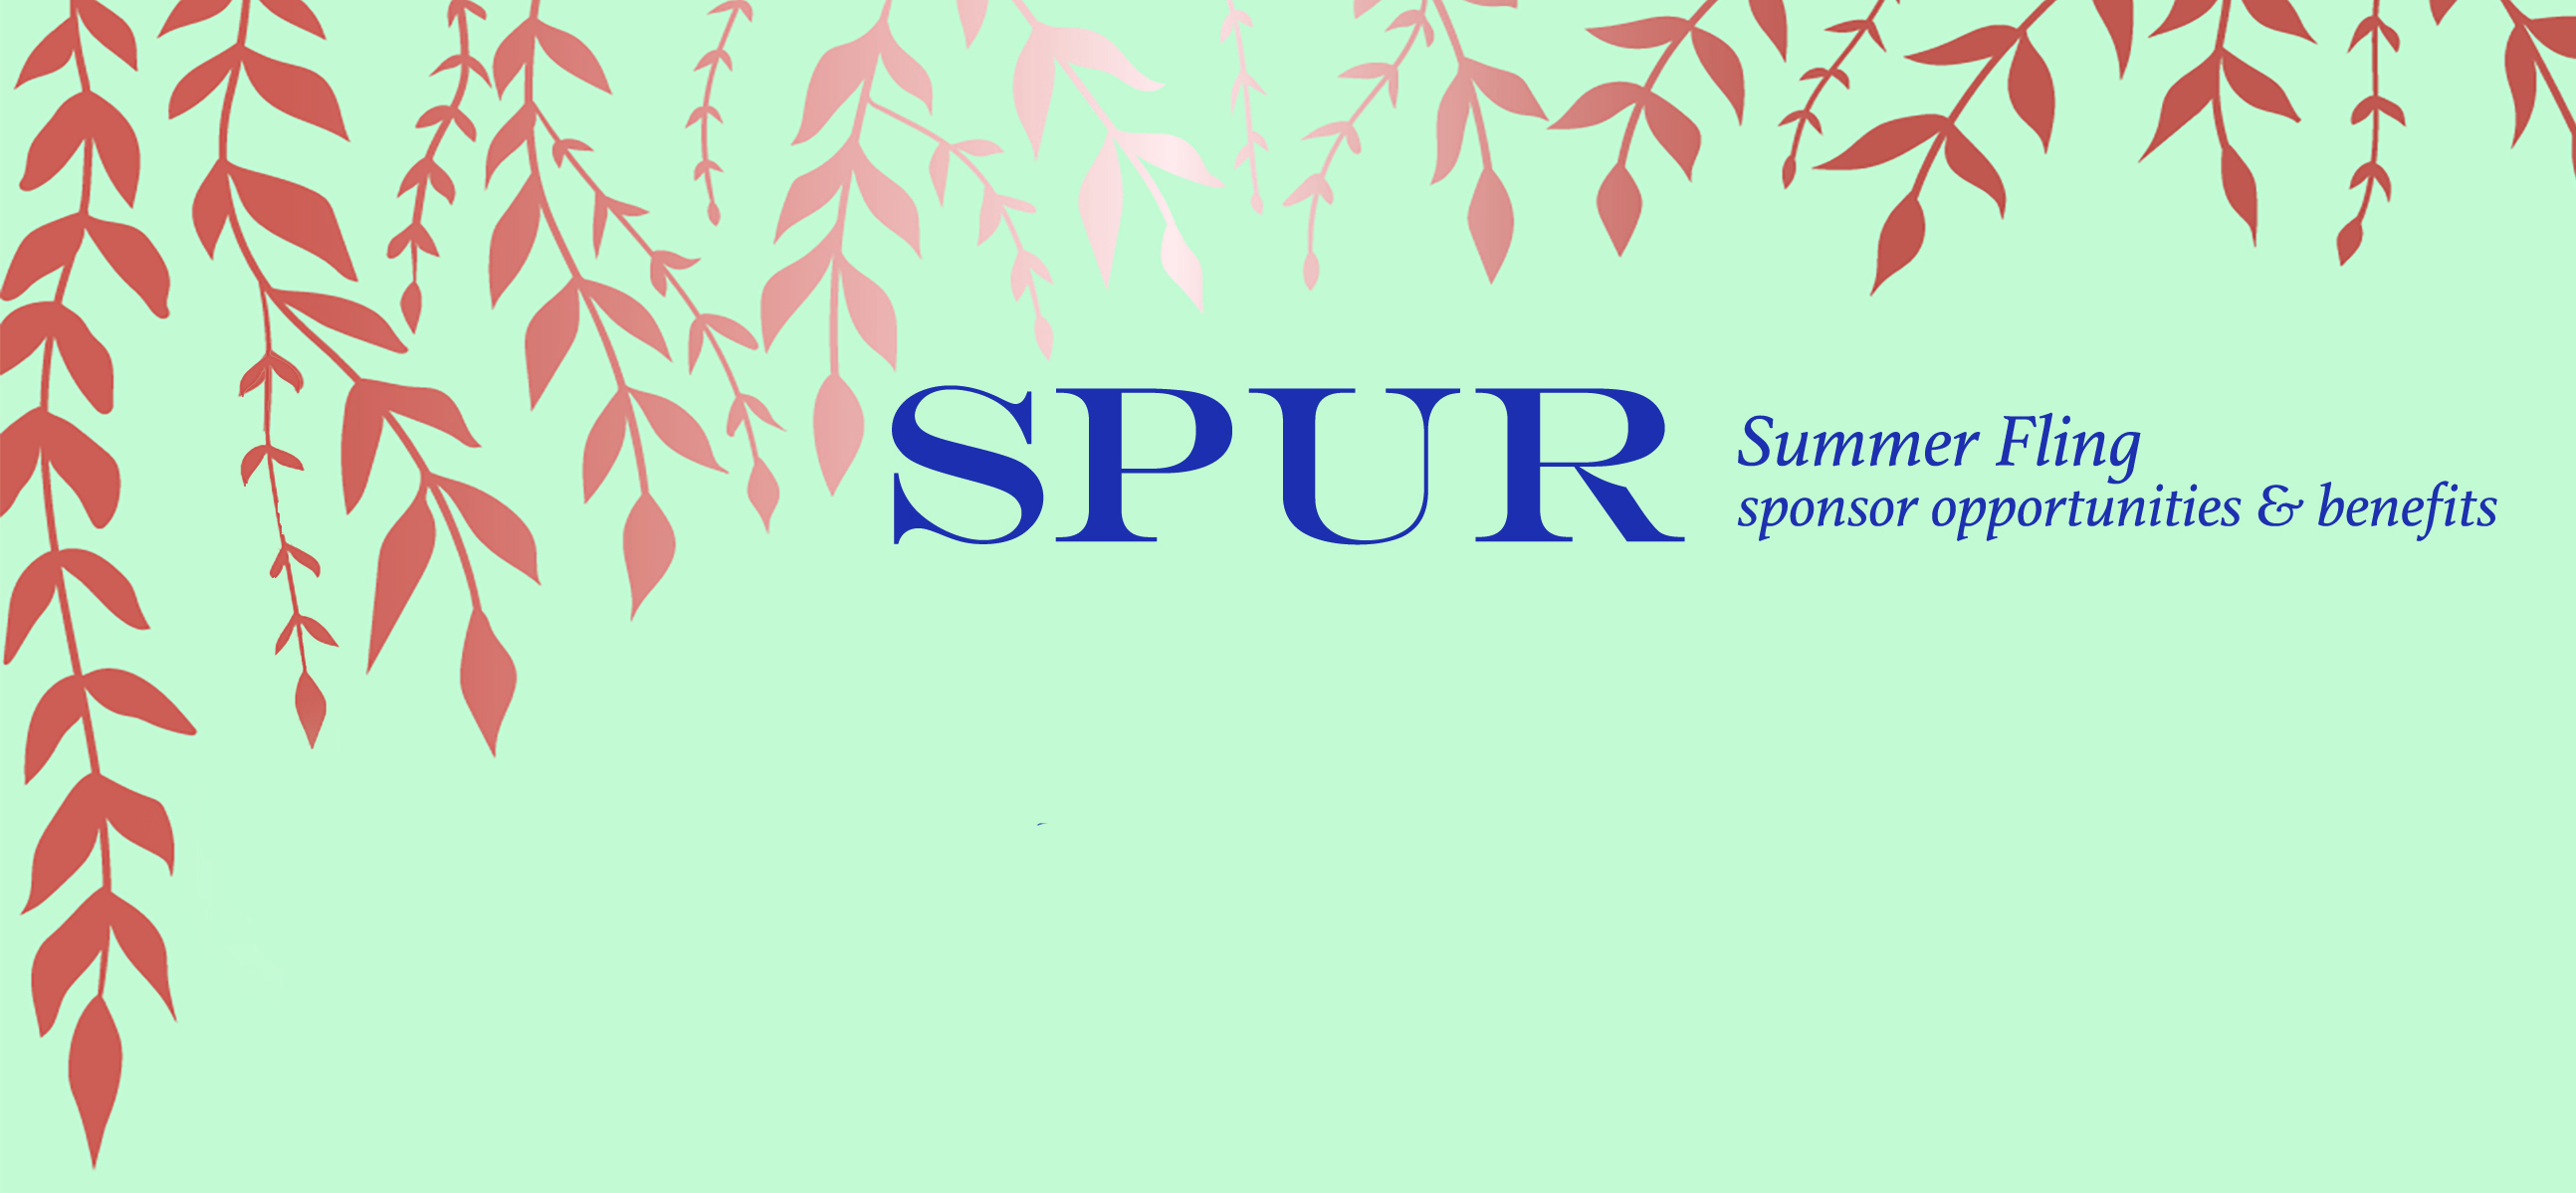 2019 Summer Fling sponsor opportunities & benefits form header.jpg